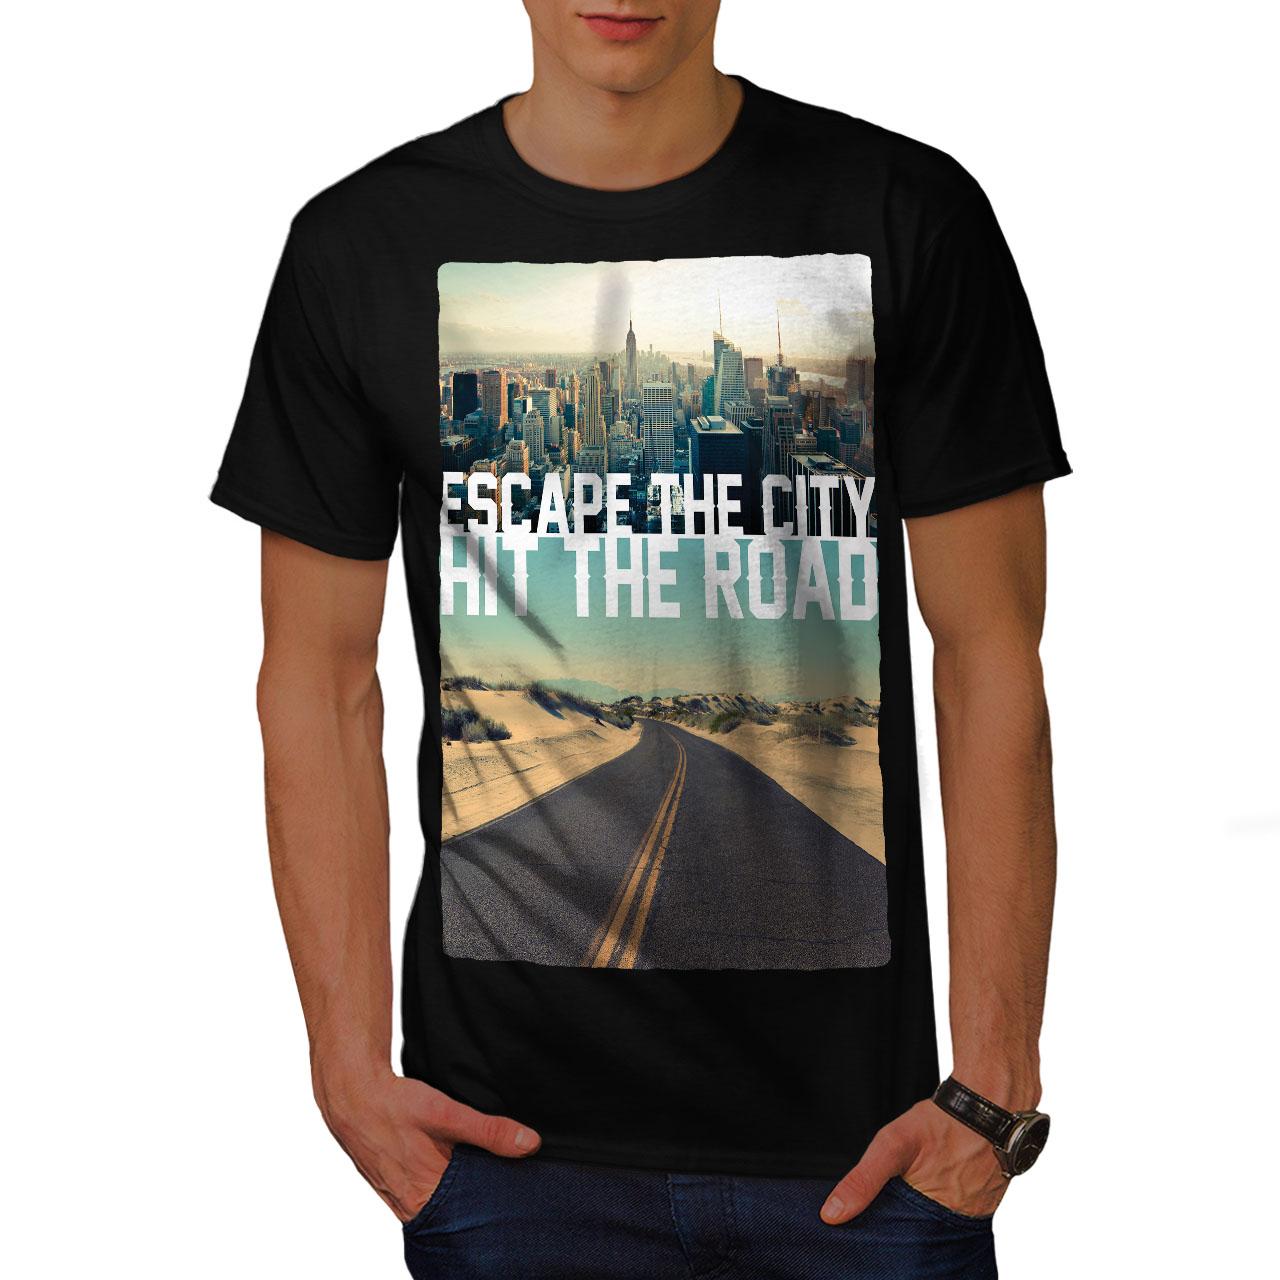 Wellcoda-Escape-The-City-Herren-T-Shirt-Lifestyle-Grafikdesign-Printed-Tee Indexbild 3